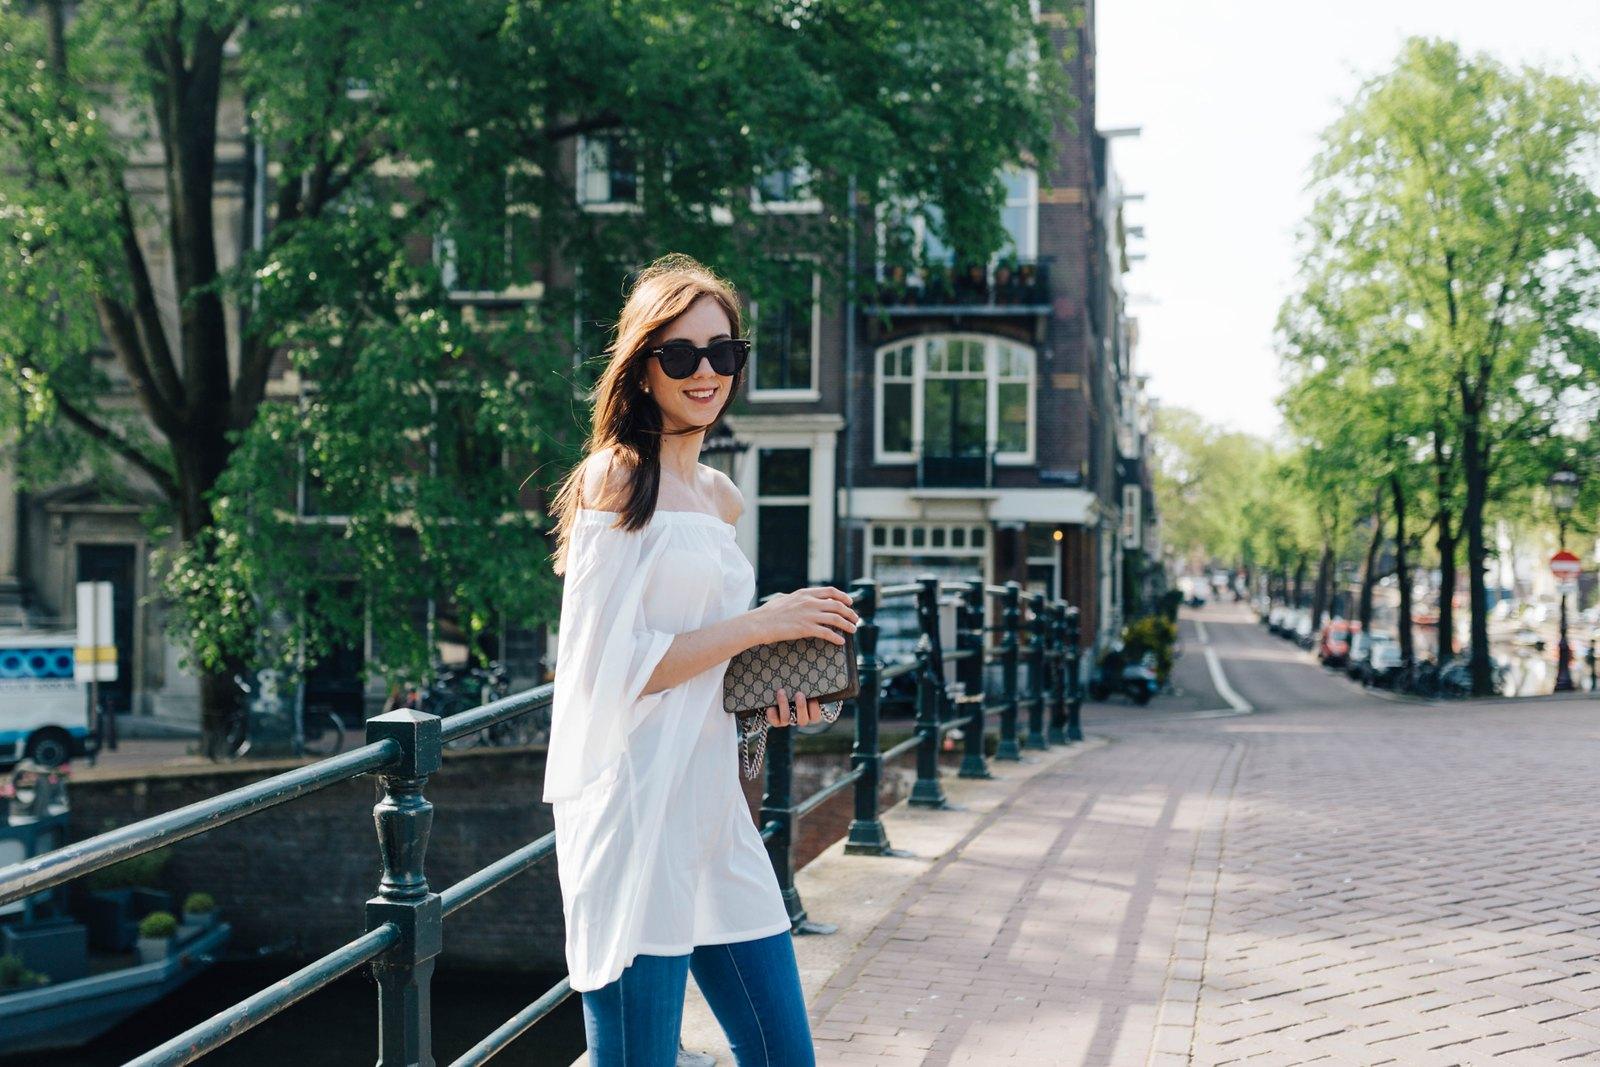 amsterdamphotowalk-114